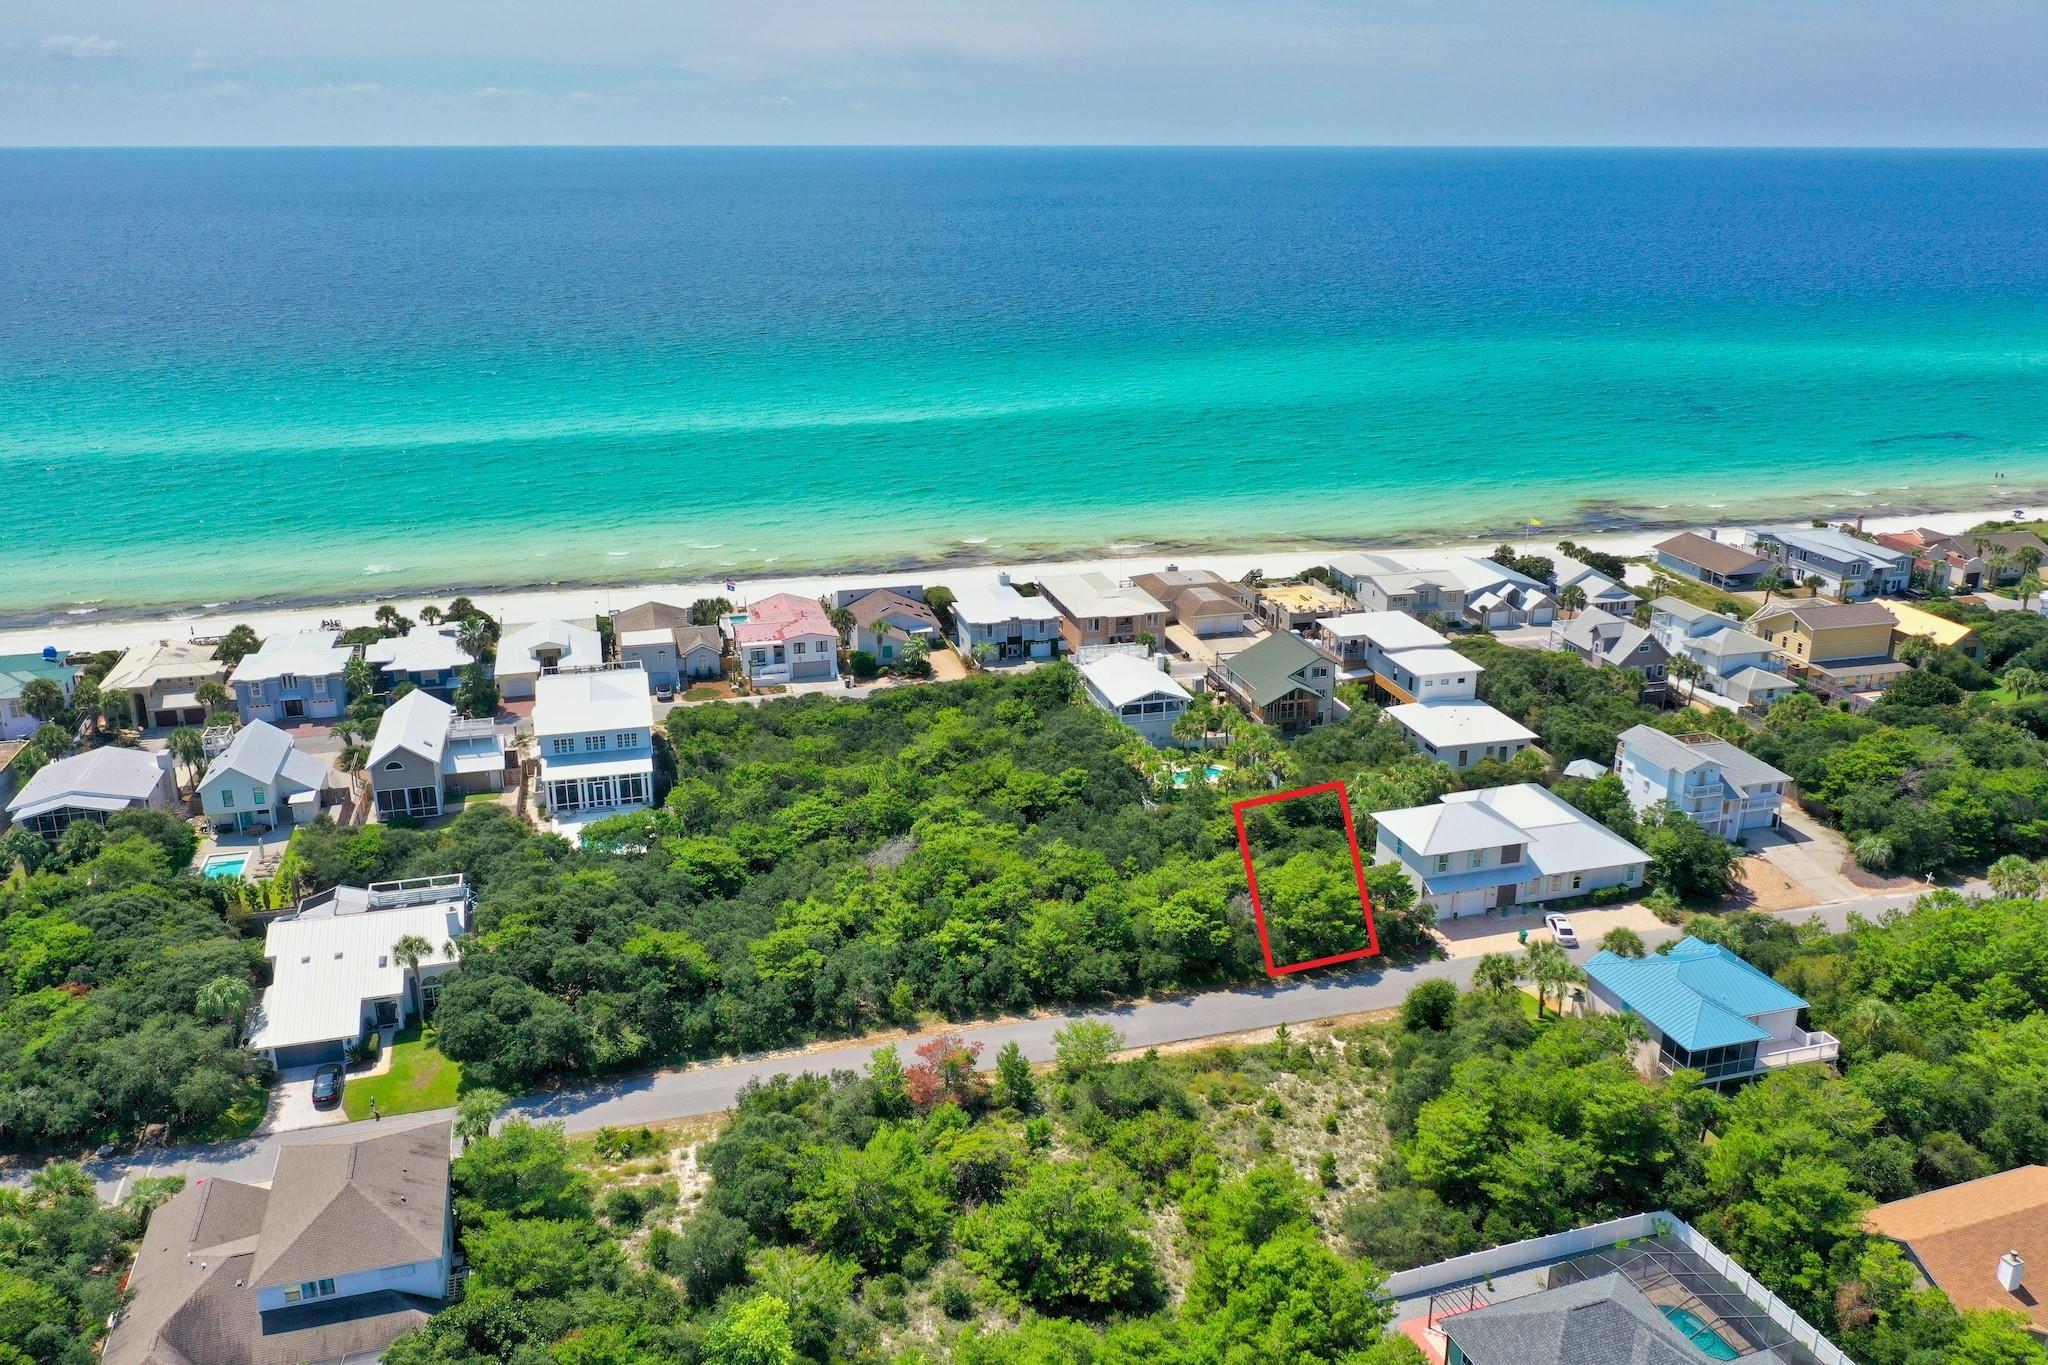 Photo of home for sale at Lot 6 Walton Buena Vista, Seacrest FL